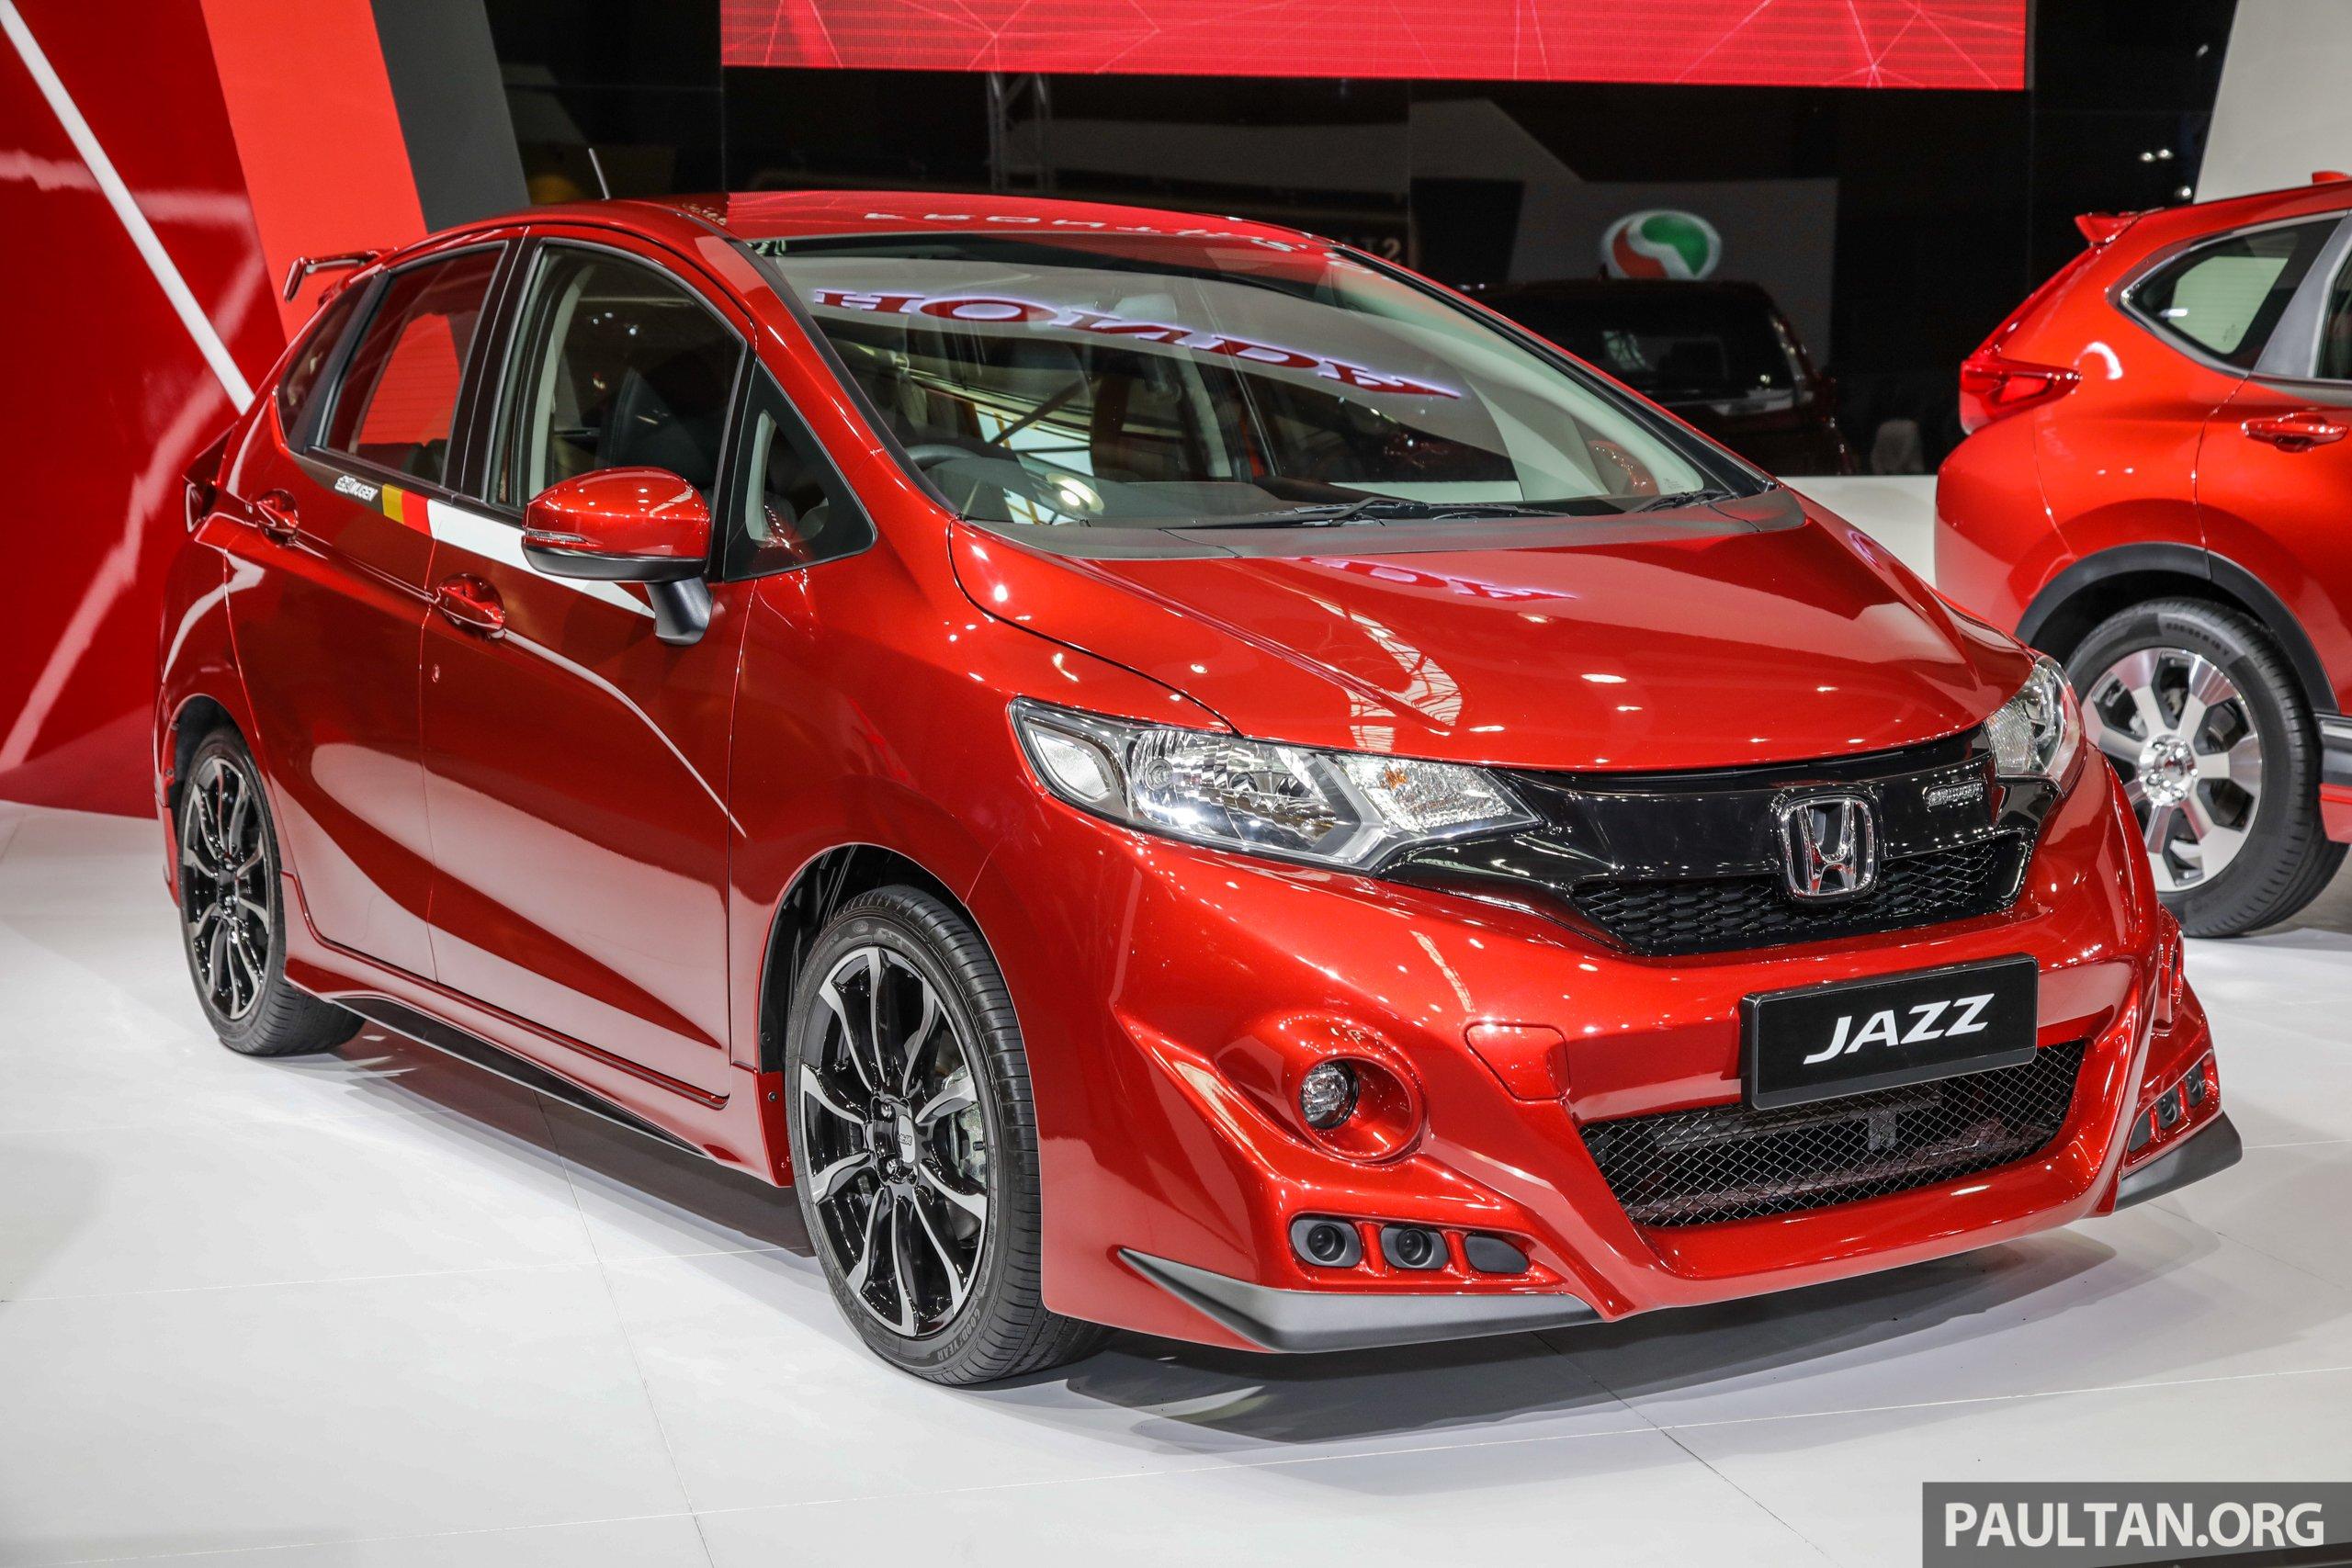 Honda Jazz Mugen At The Malaysia Autoshow 2019 Paultan Org